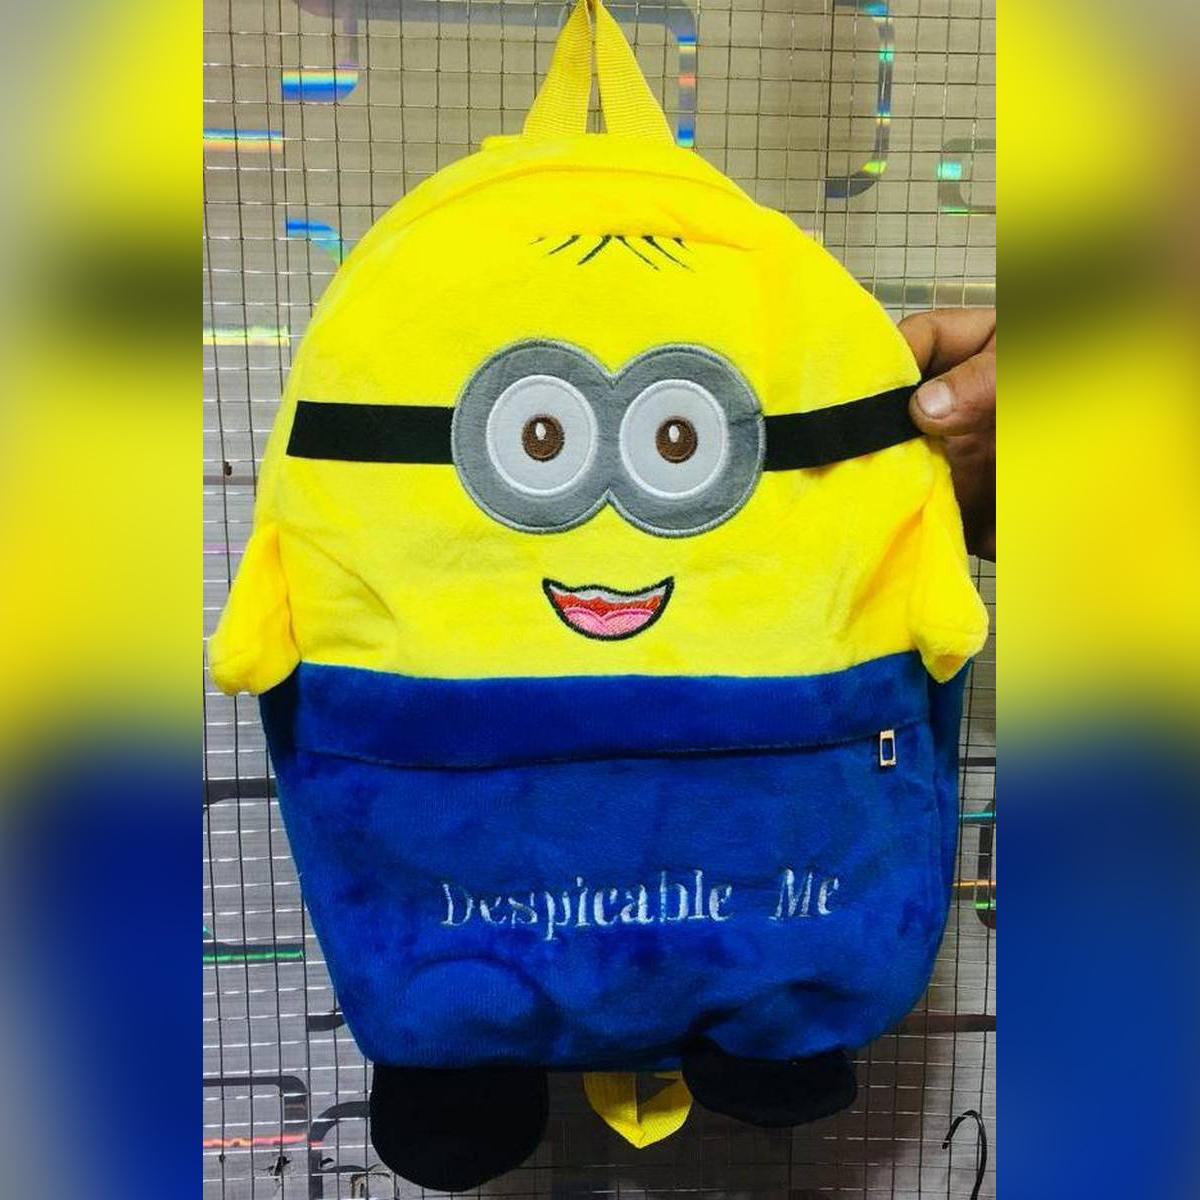 New Cute Fancy Cartoon Characters Mini Backpacks School Bags for Kids Baby Girls Boys Baba and Babies Shoulder Bag Pack